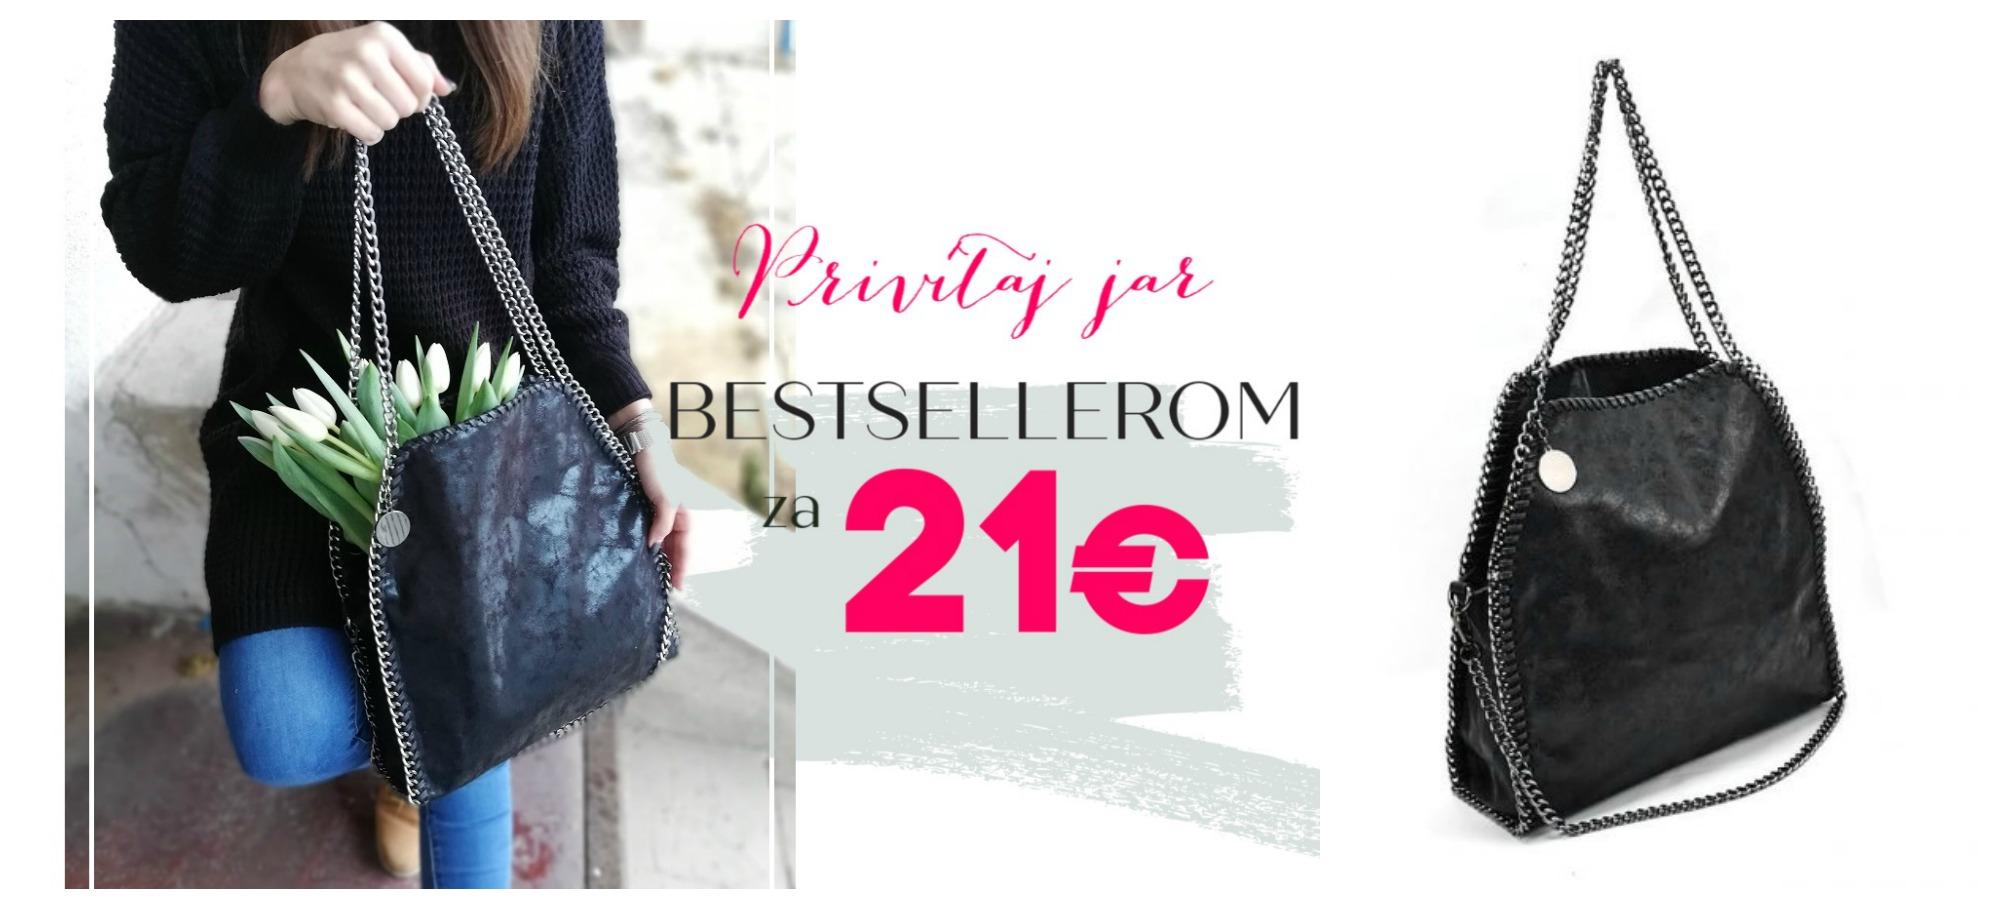 Privítaj jar BESTSELLEROM za 21€ !!!